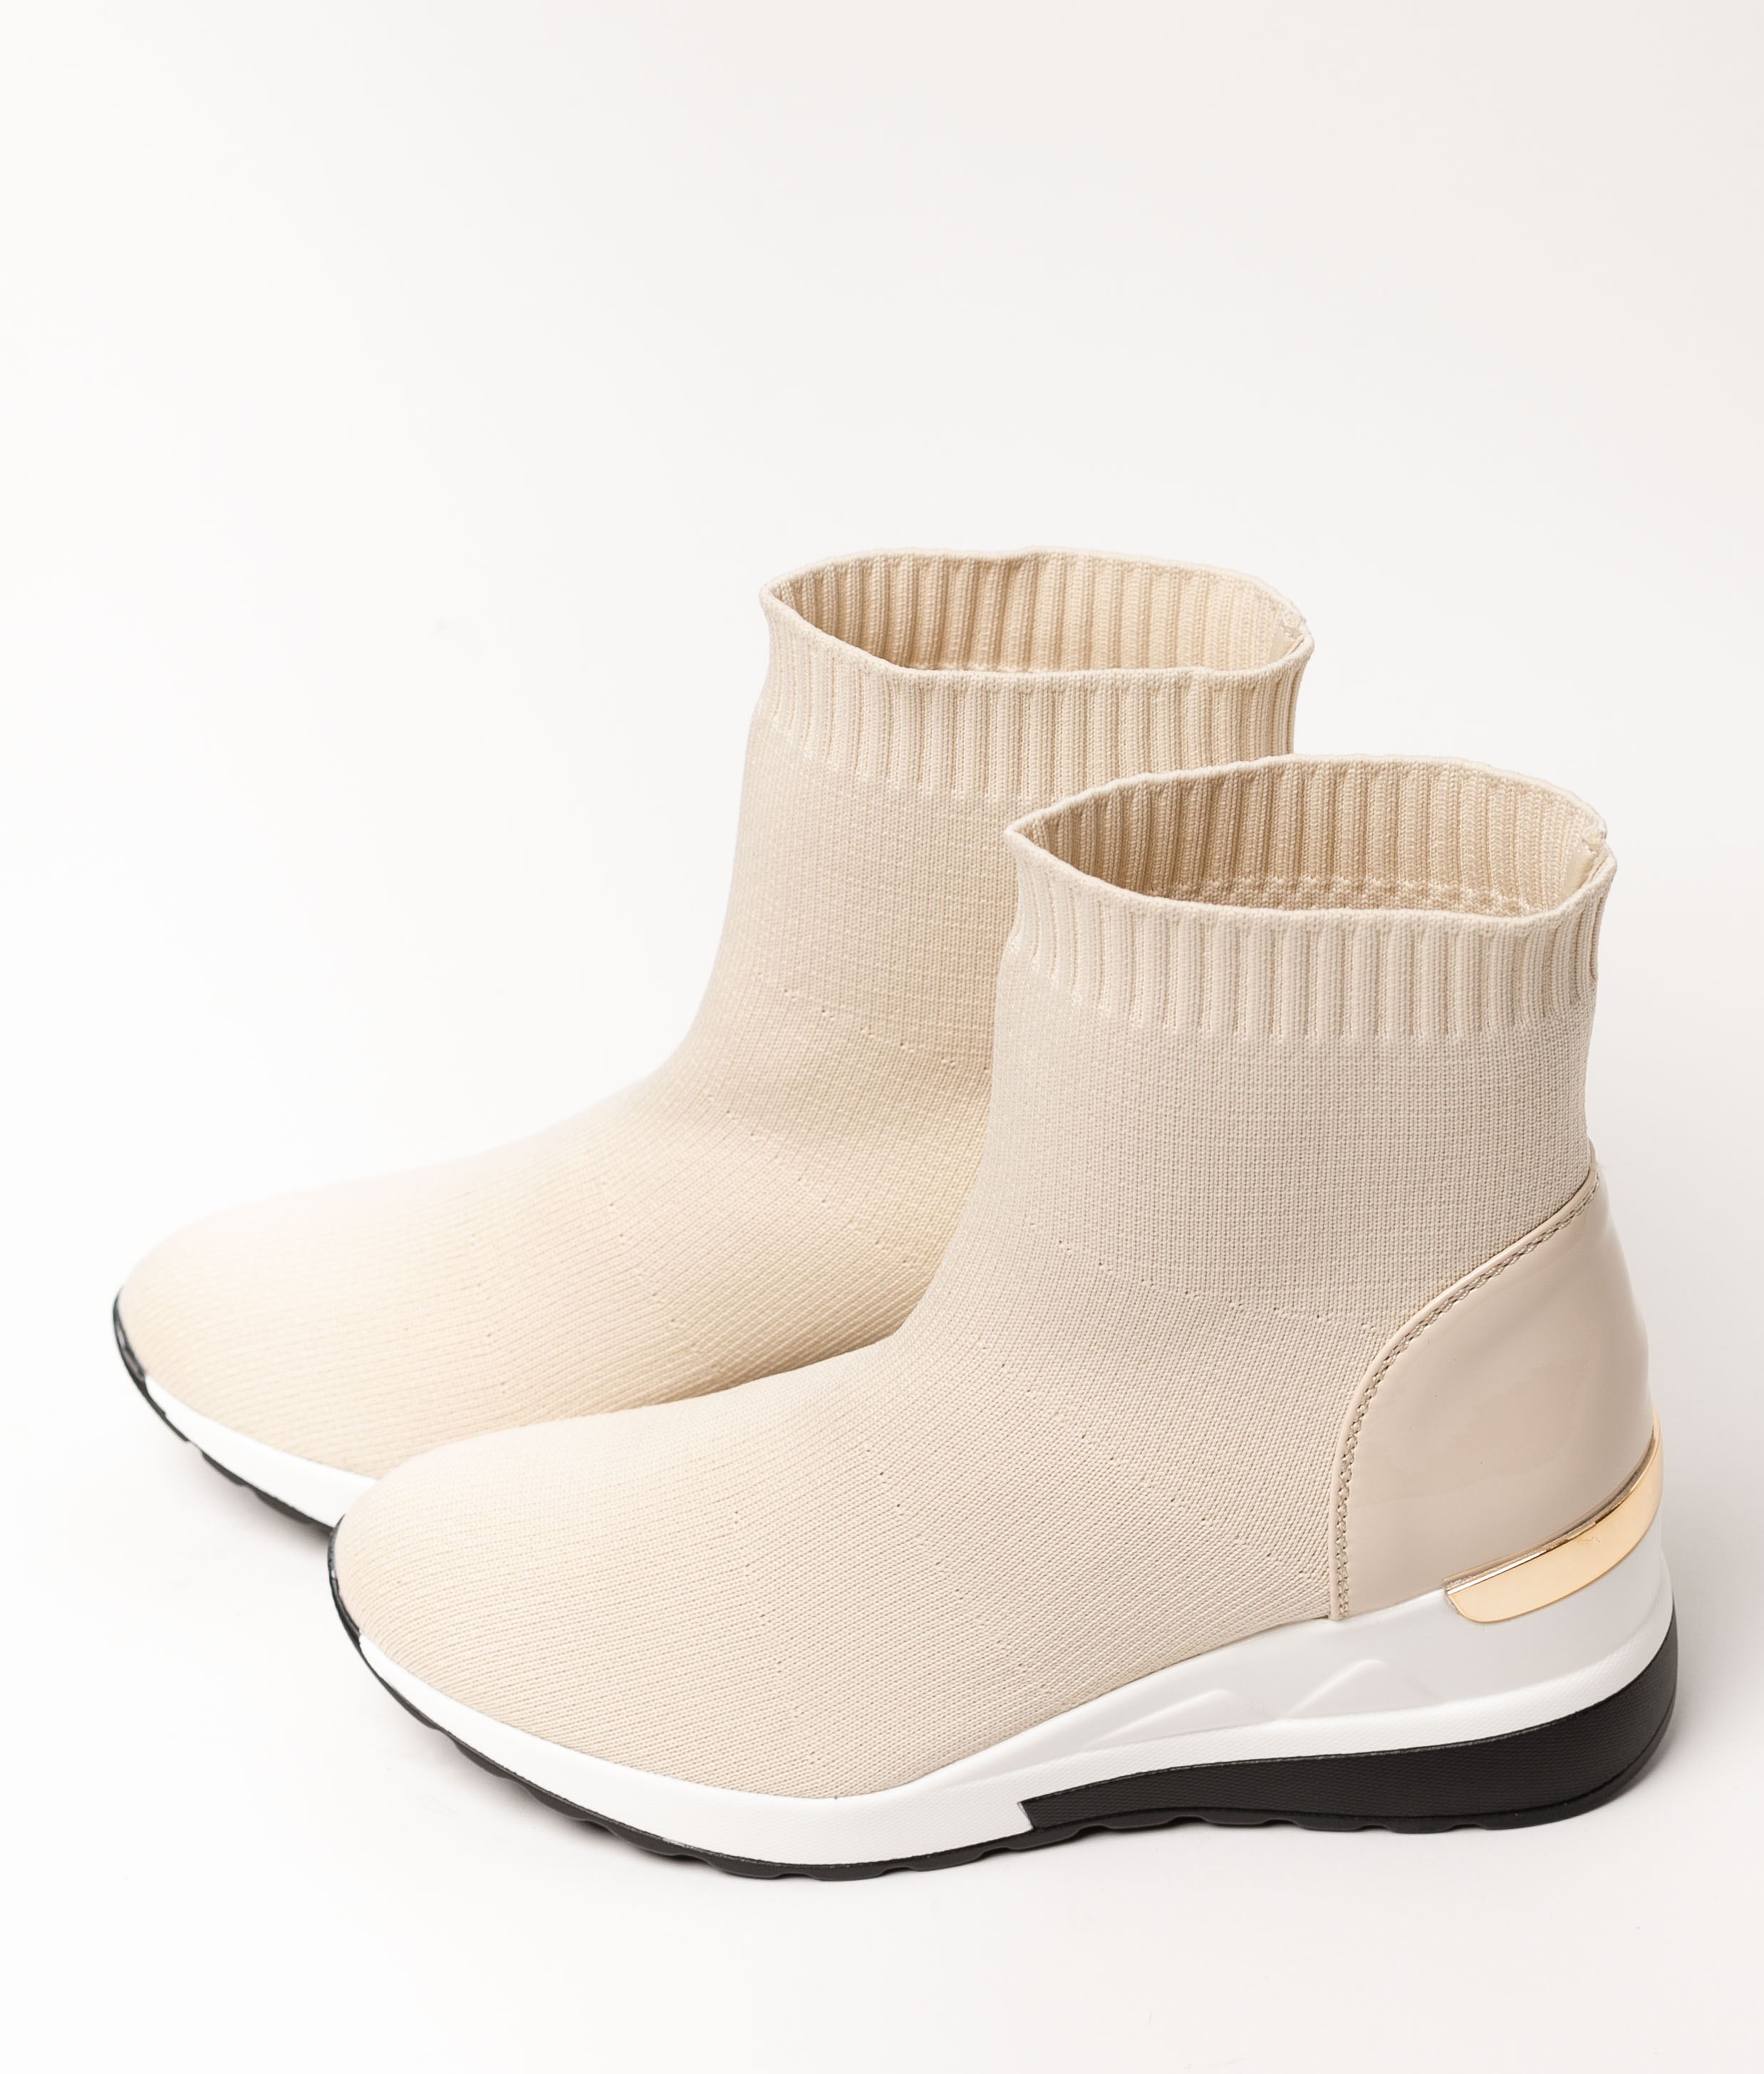 Sneakers Clubir - Noir